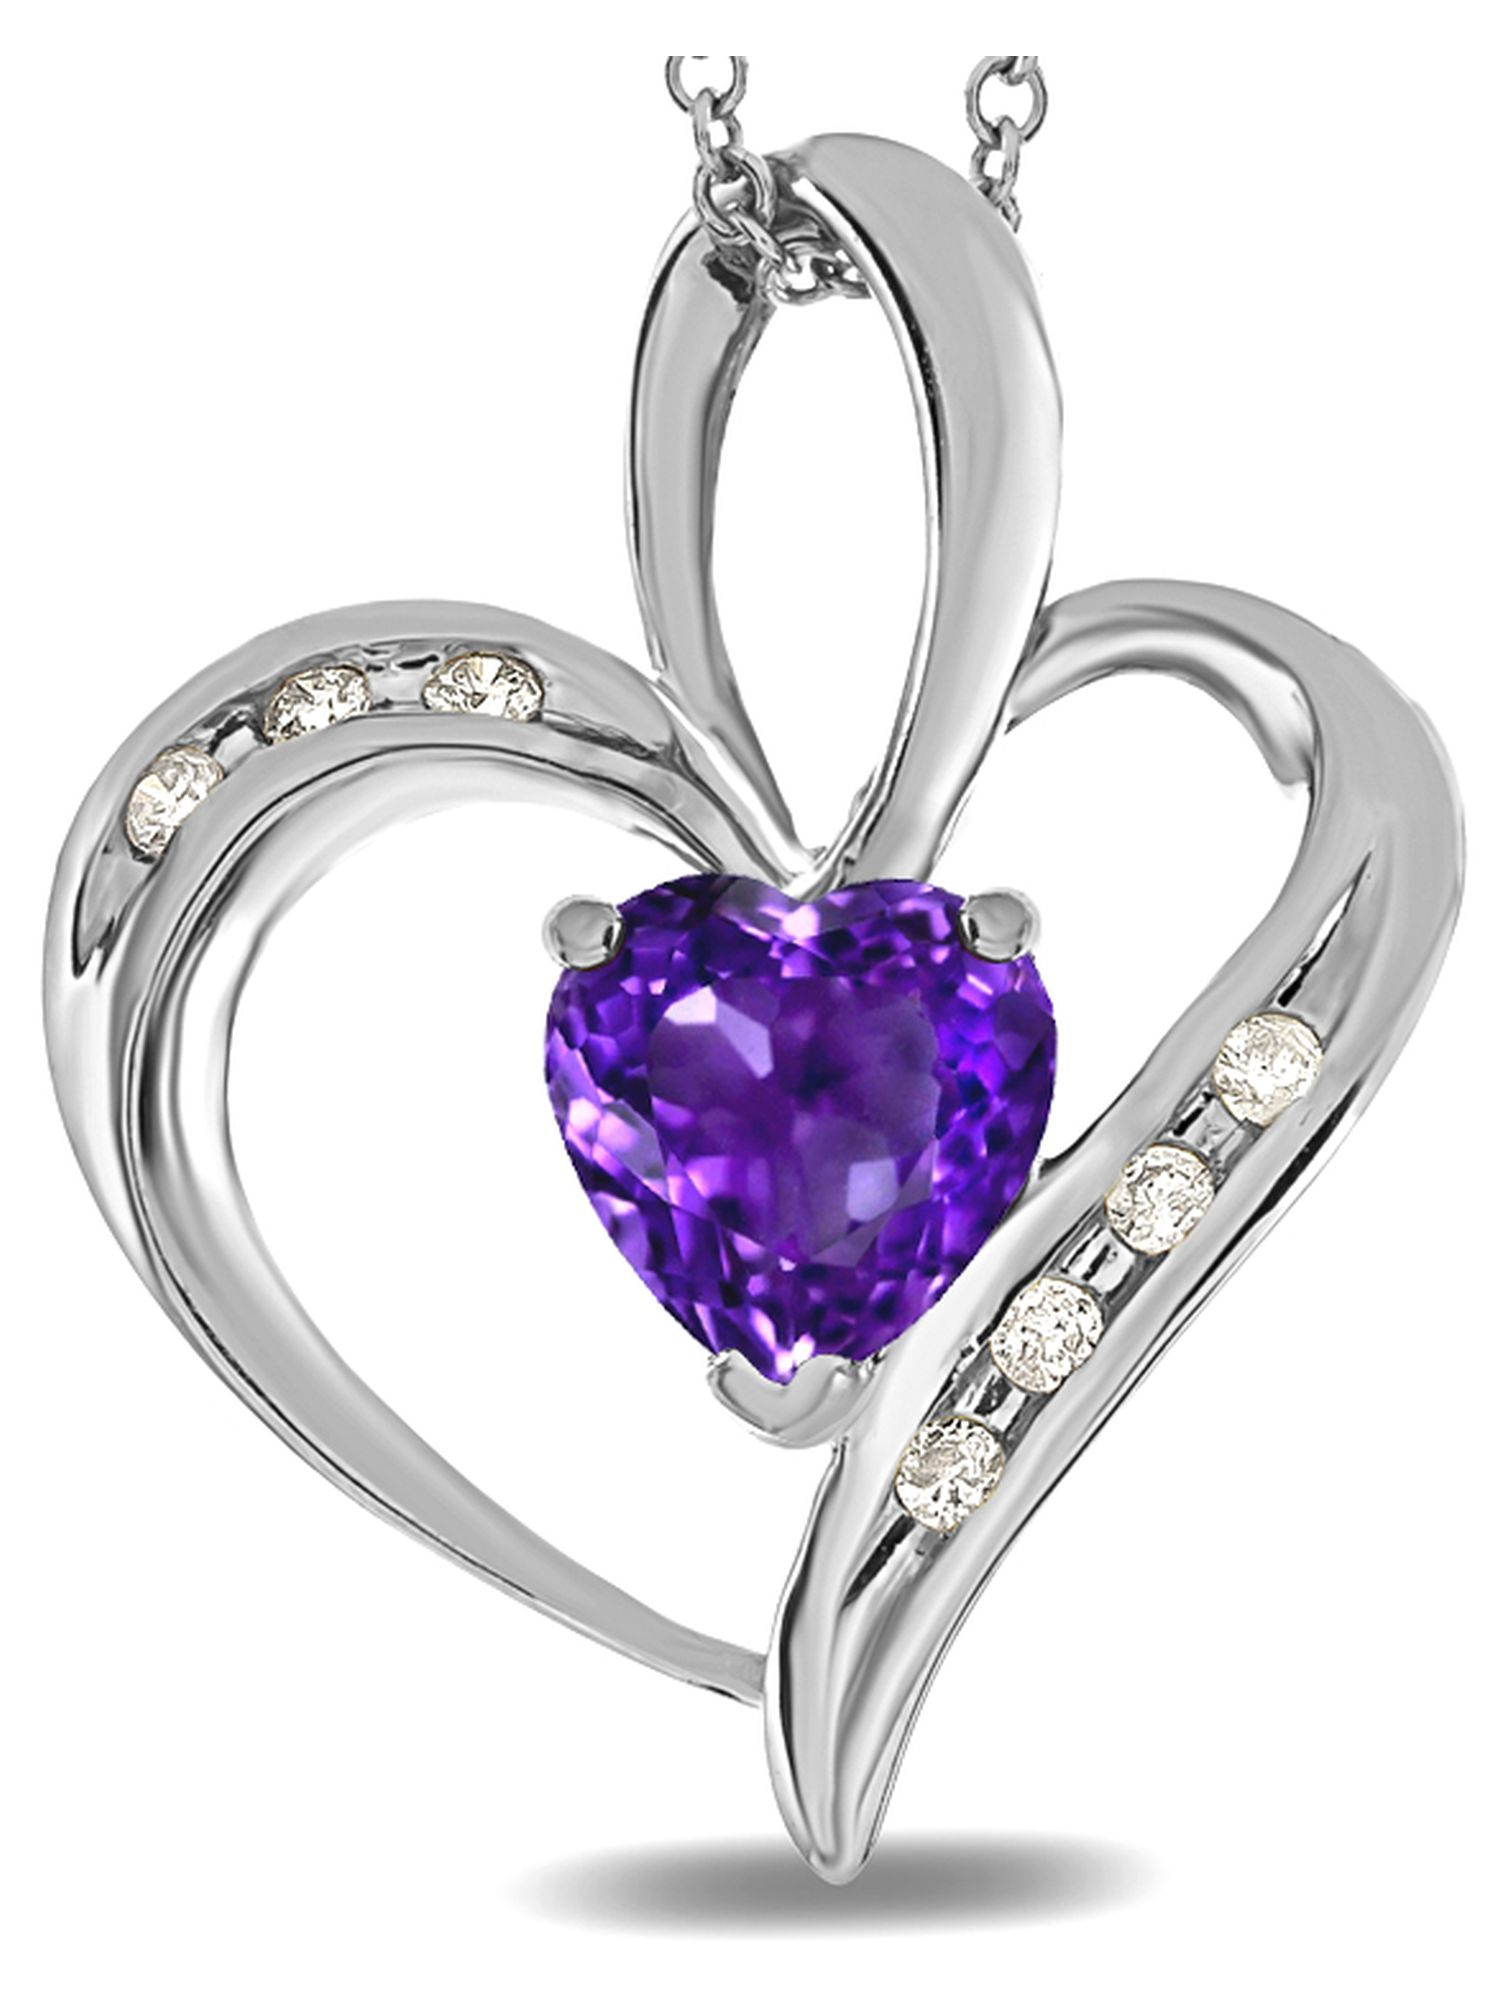 Star K Heart Shape 6mm Genuine Amethyst Pendant Necklace by Star K